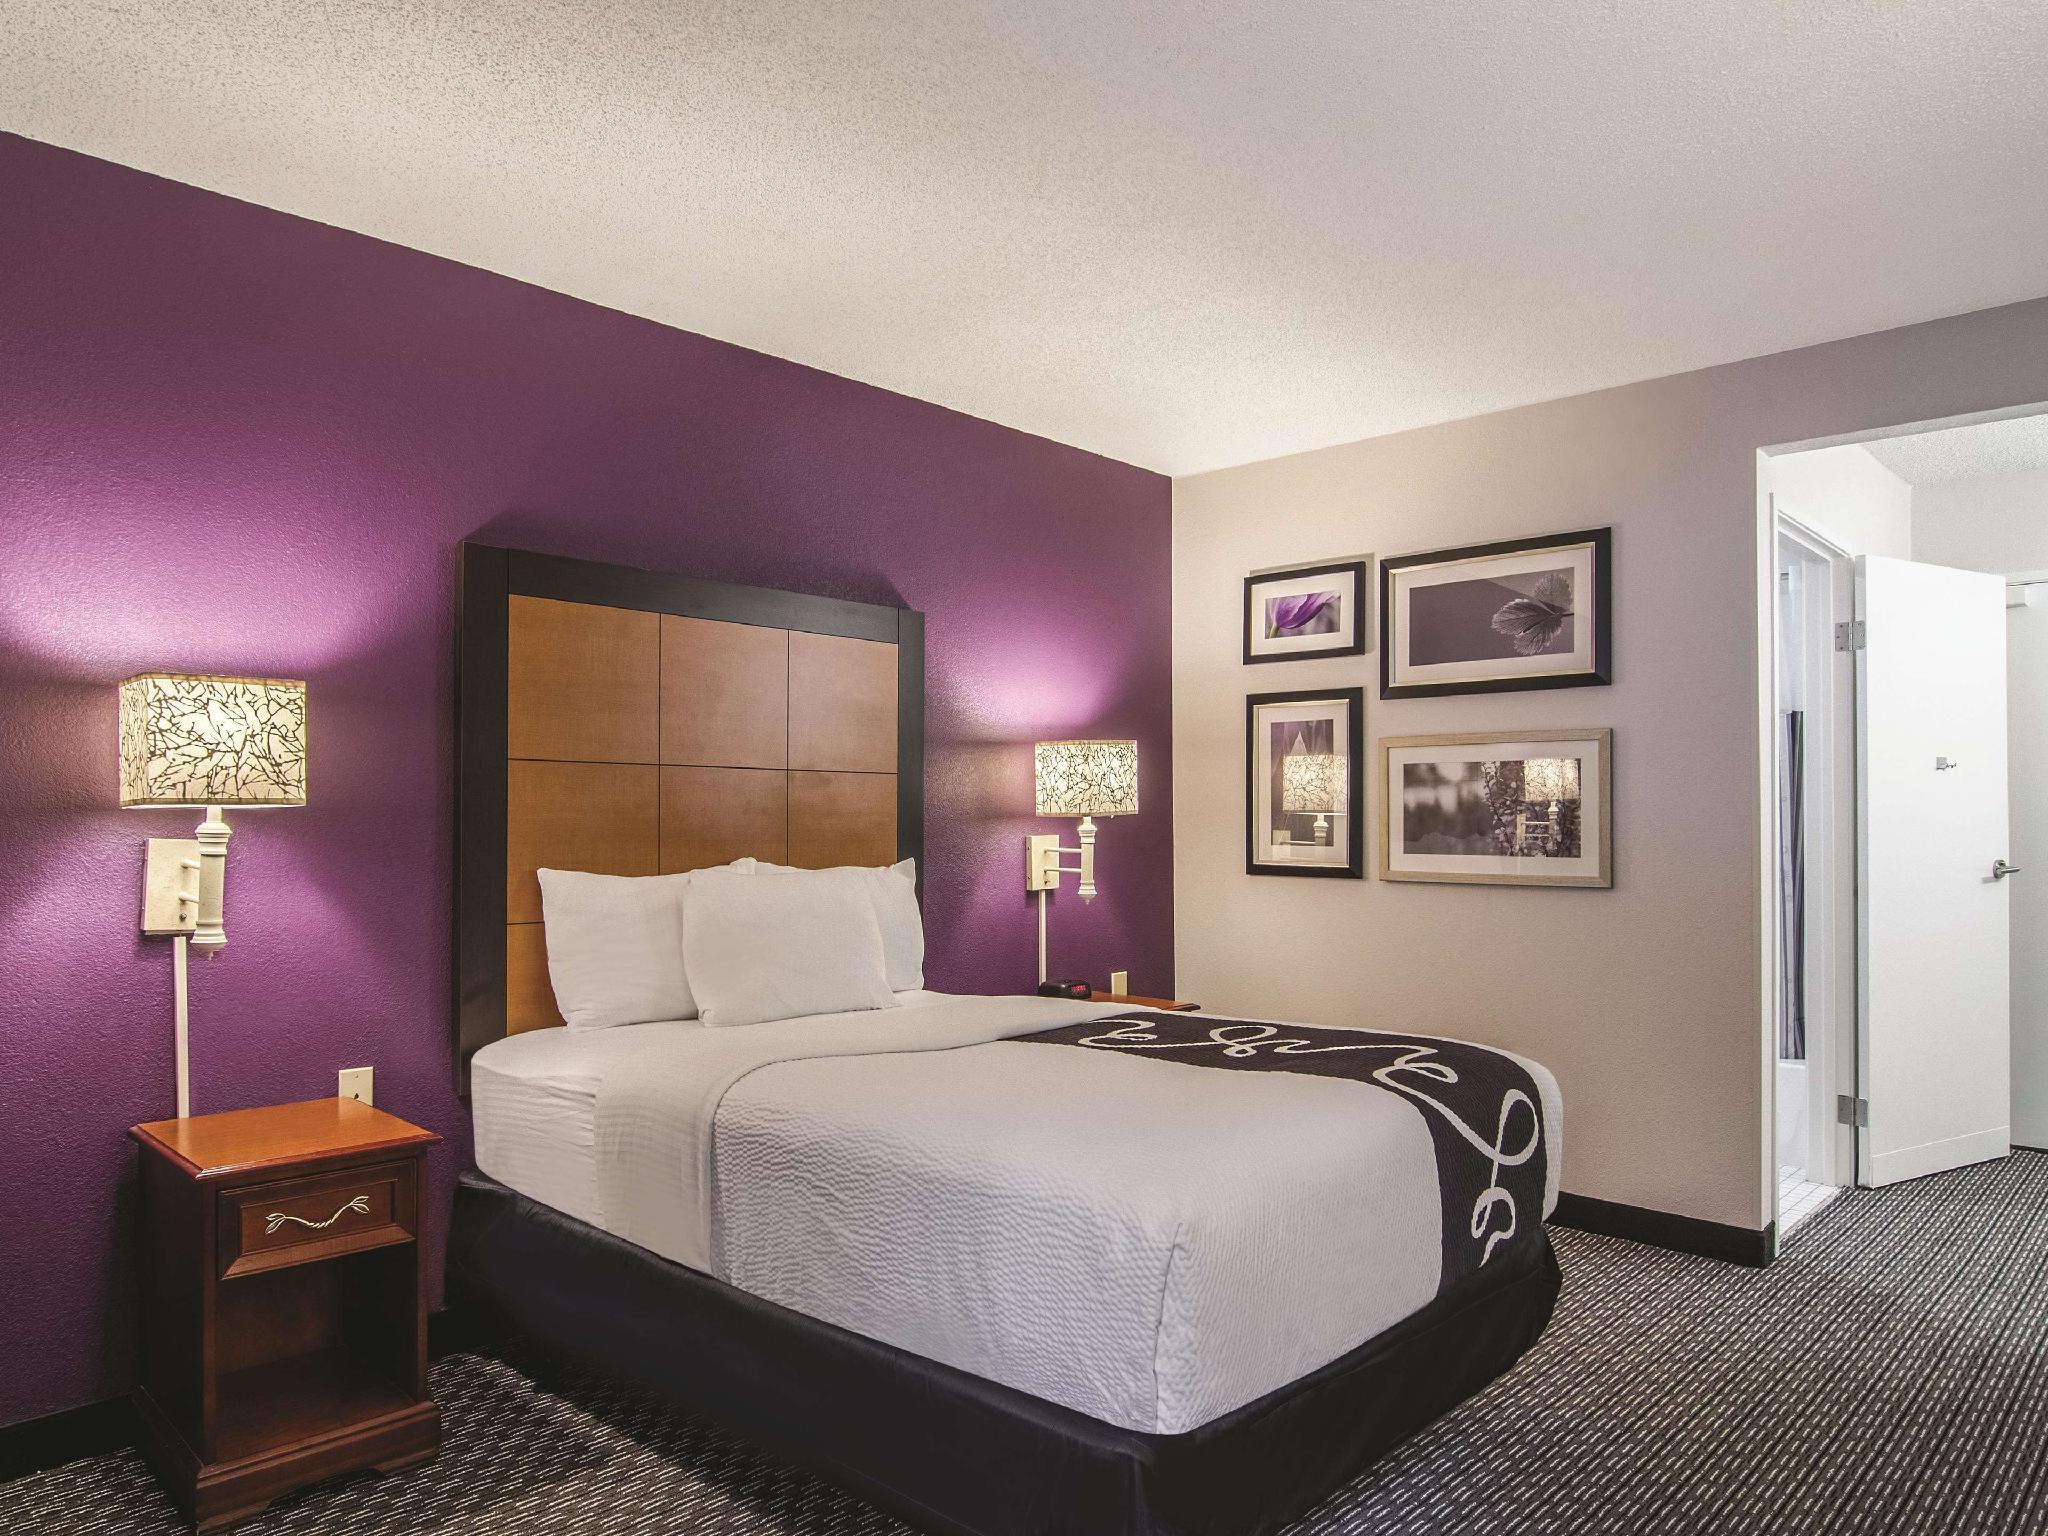 La Quinta Inn & Suites By Wyndham Miami Airport East